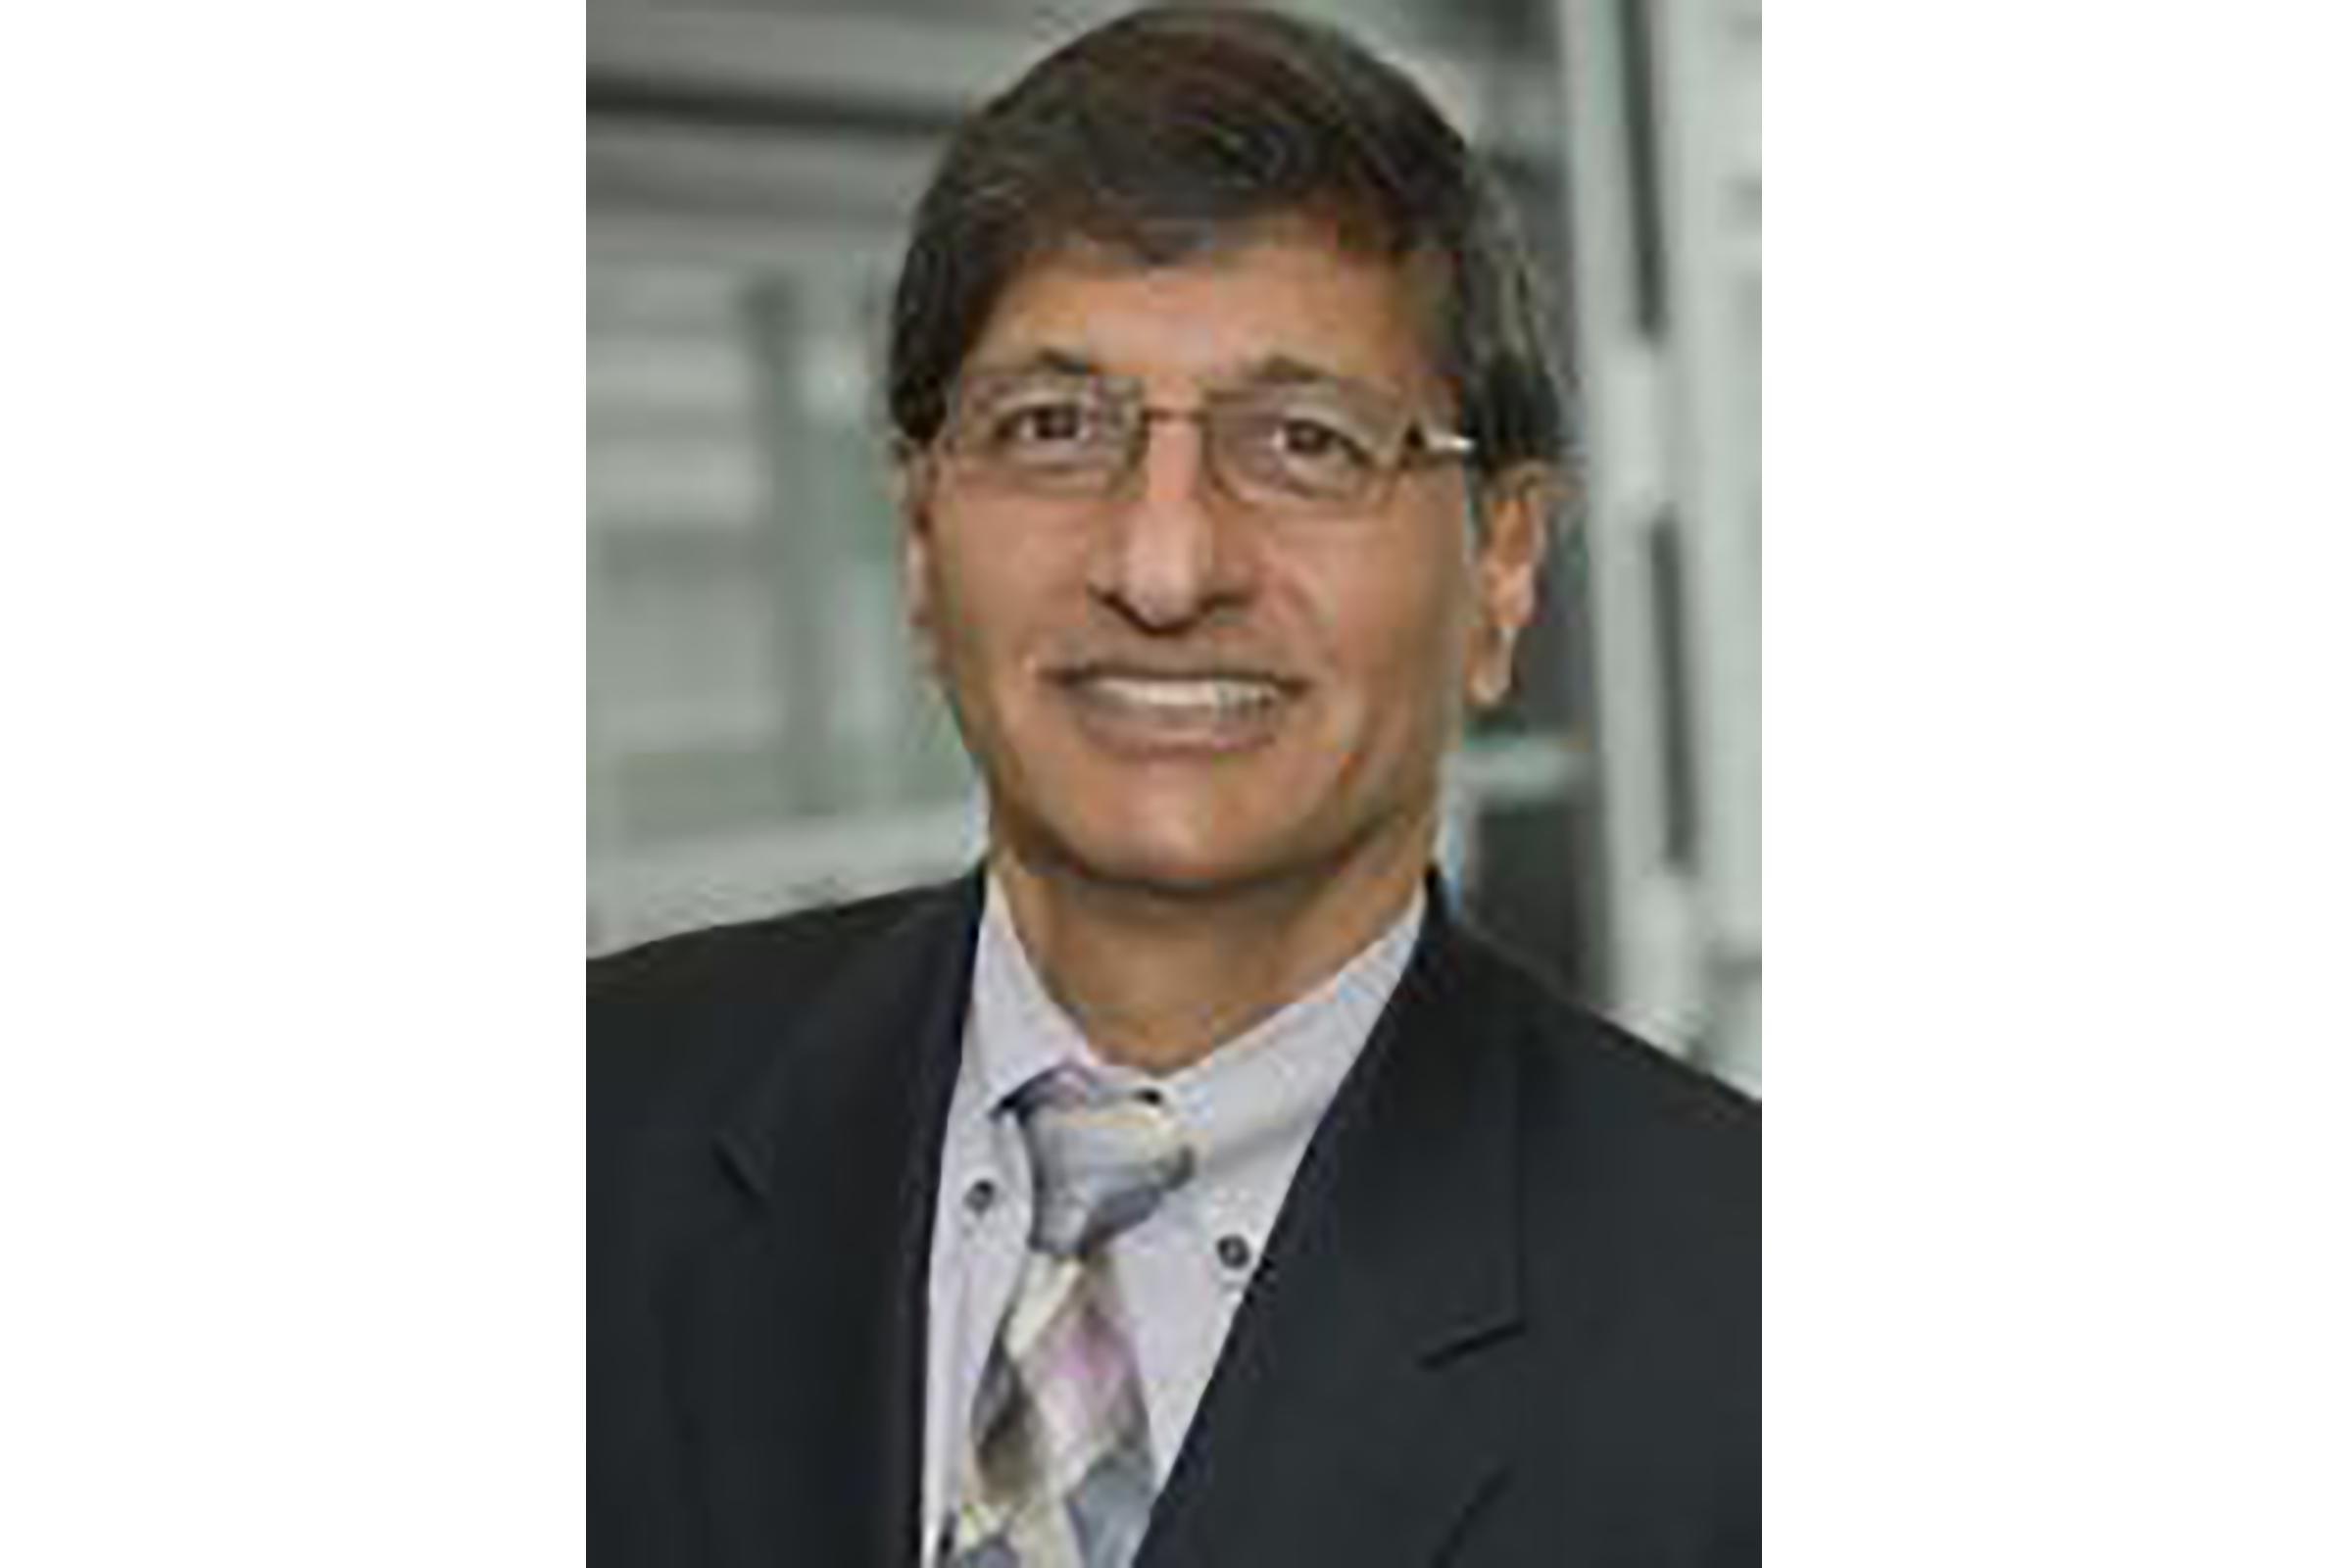 krishnaswamy srinivasan is a Professor in the Department of Mechanical & Aerospace Engineering